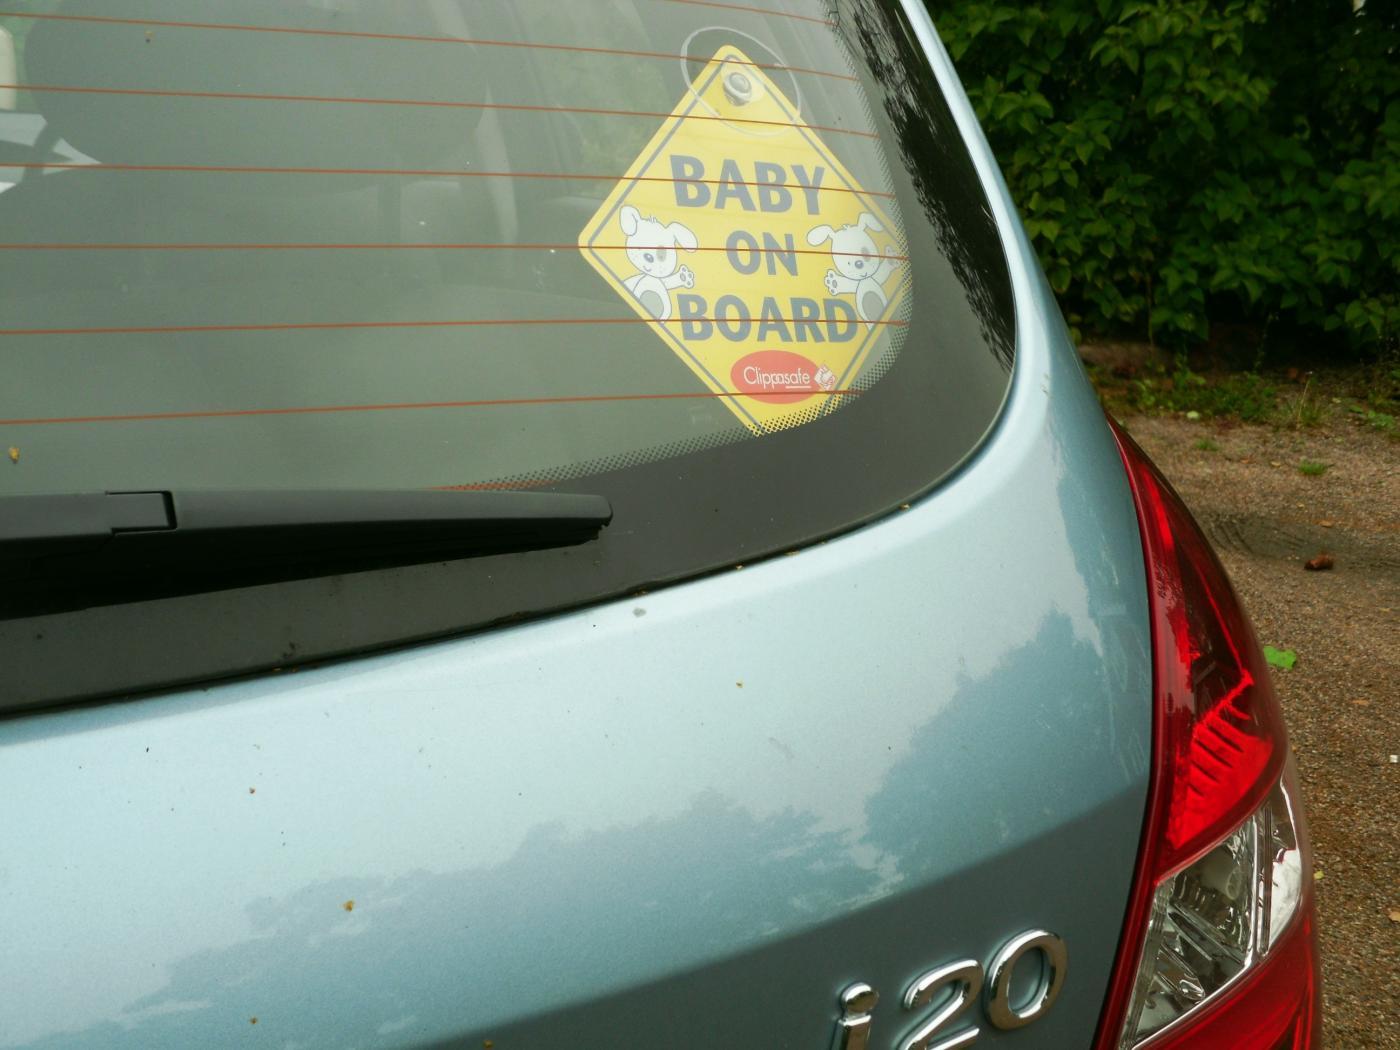 baby_on_board.jpg